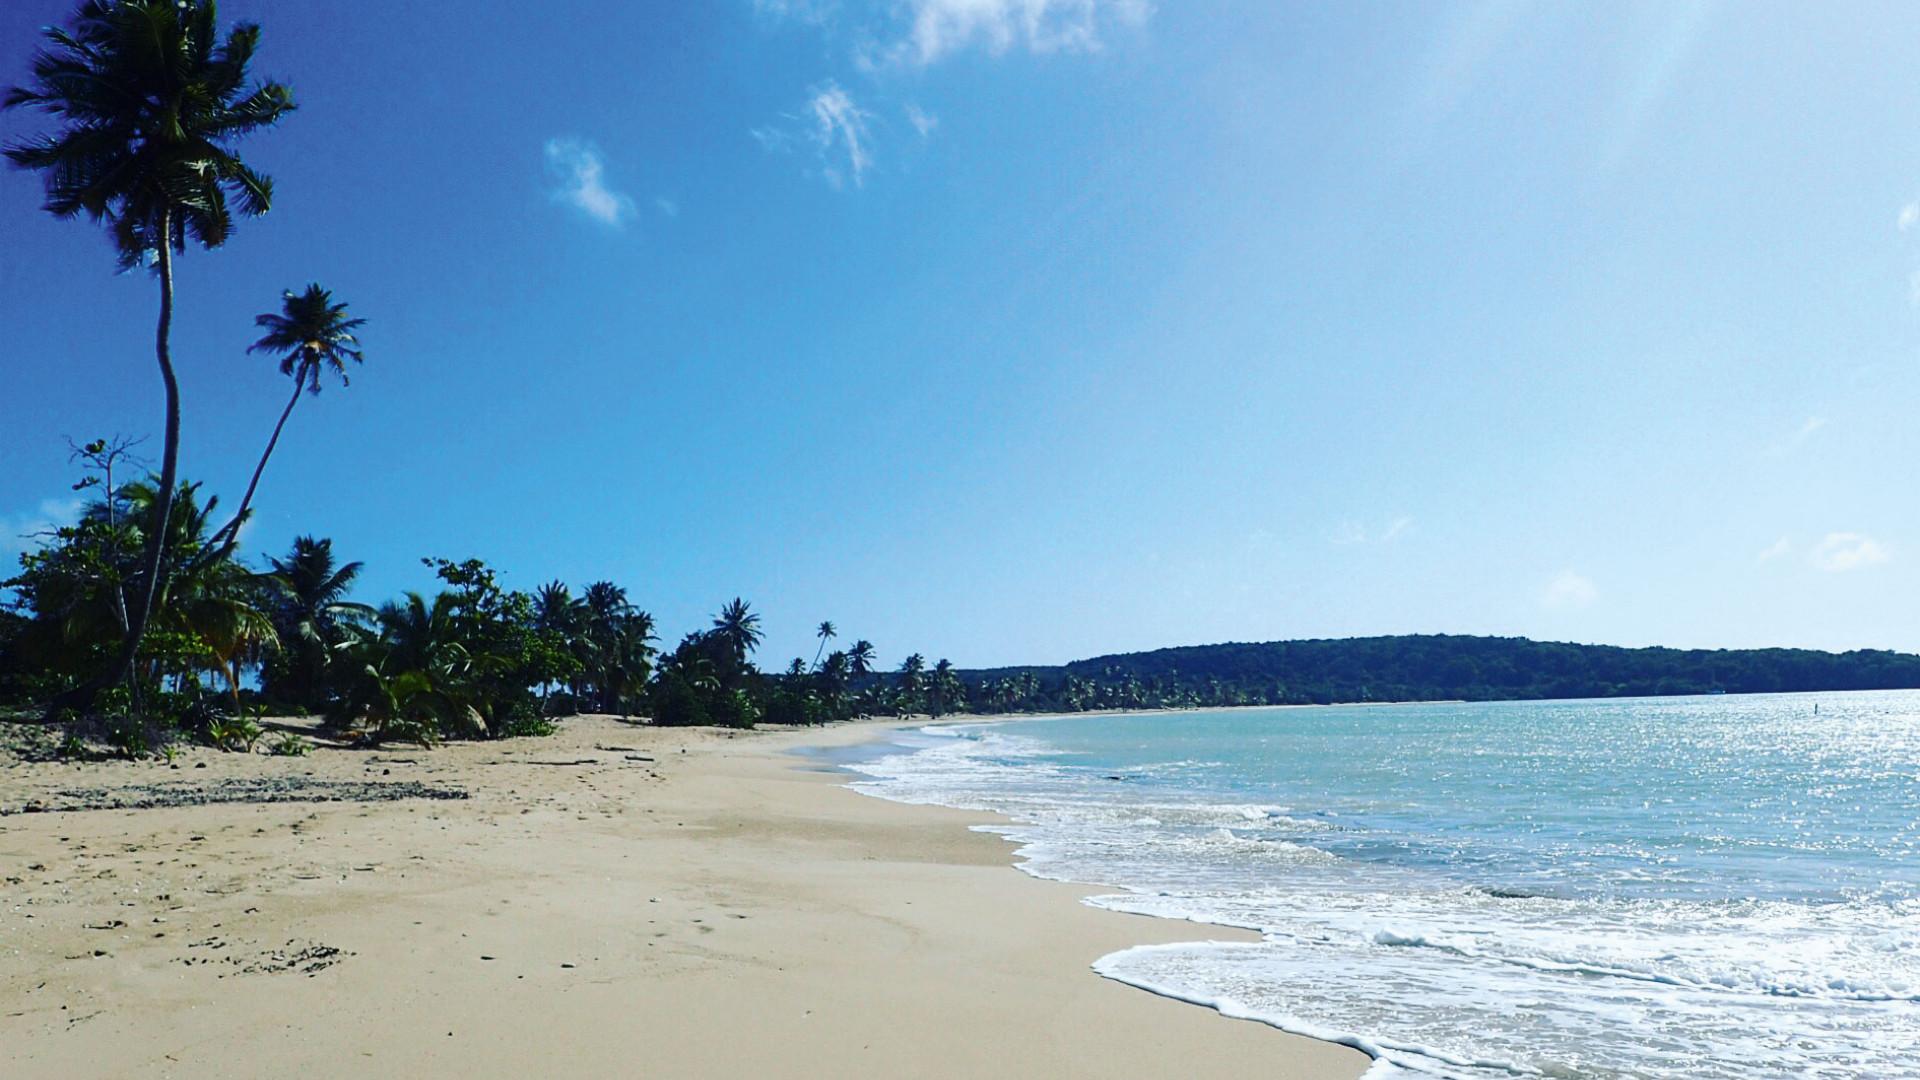 Beach view in Vieques, Puerto Rico